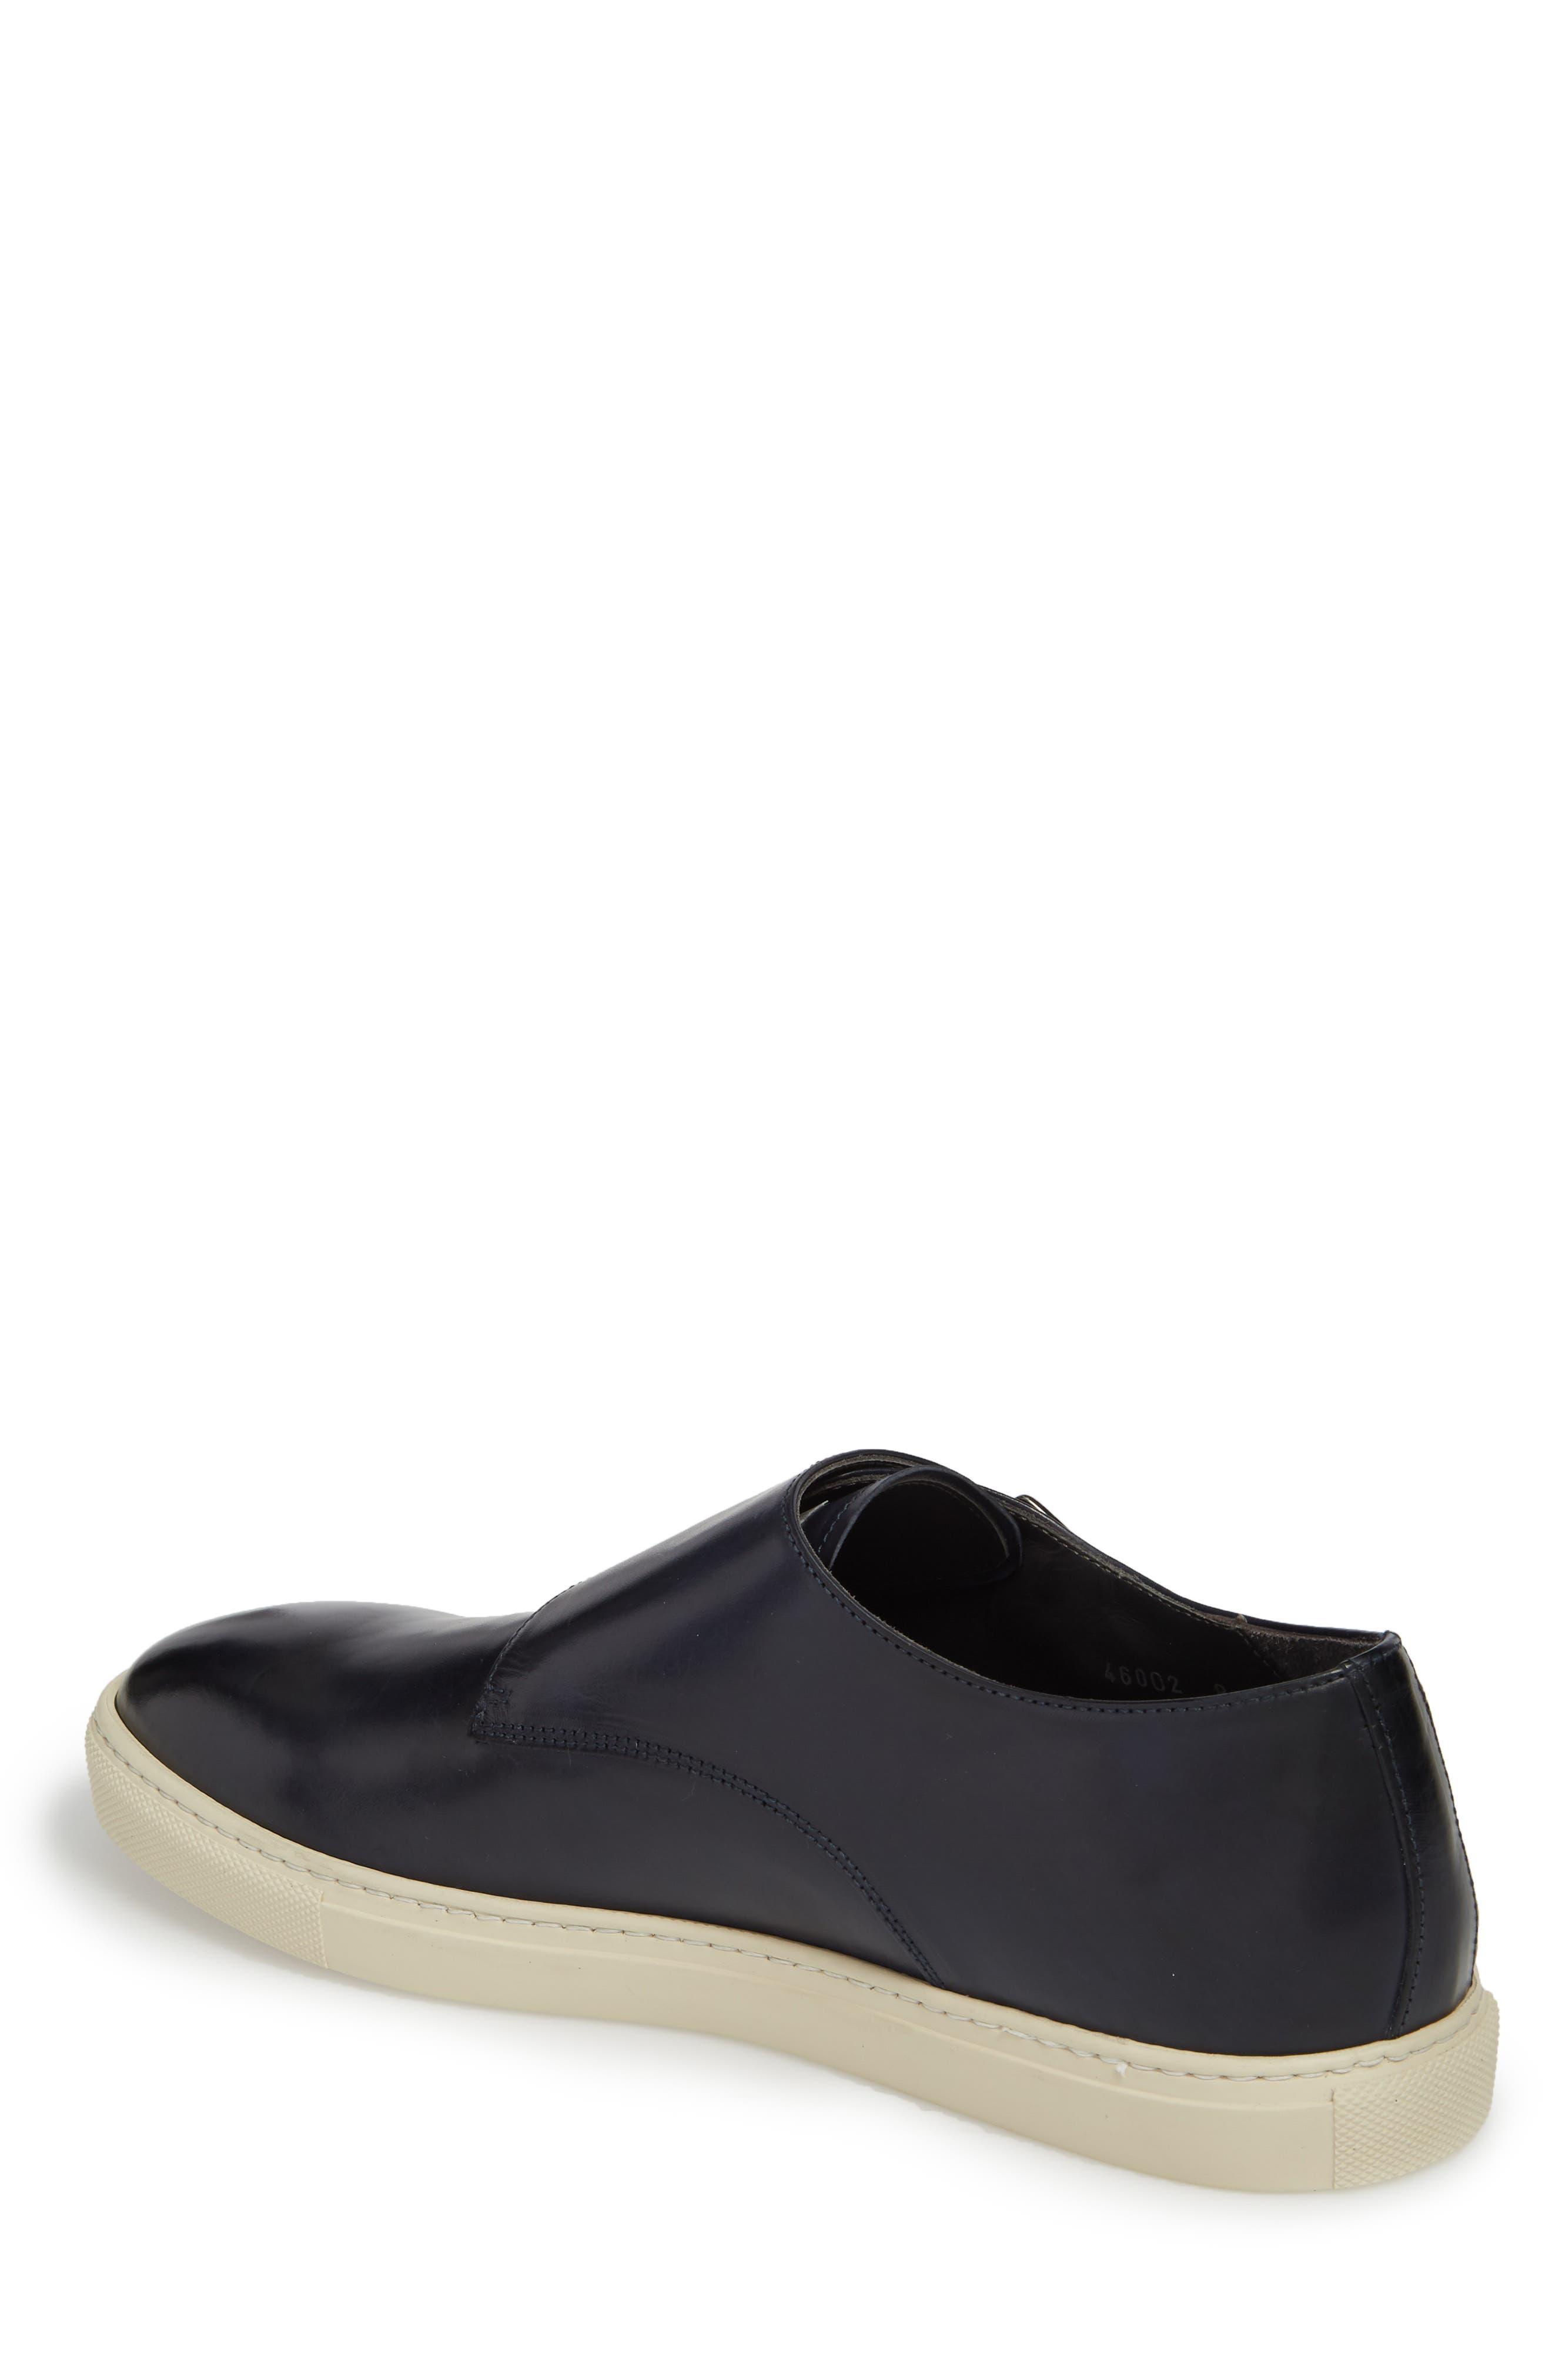 Gildden Double Monk Strap Sneaker,                             Alternate thumbnail 2, color,                             Diver Blue Marine Leather